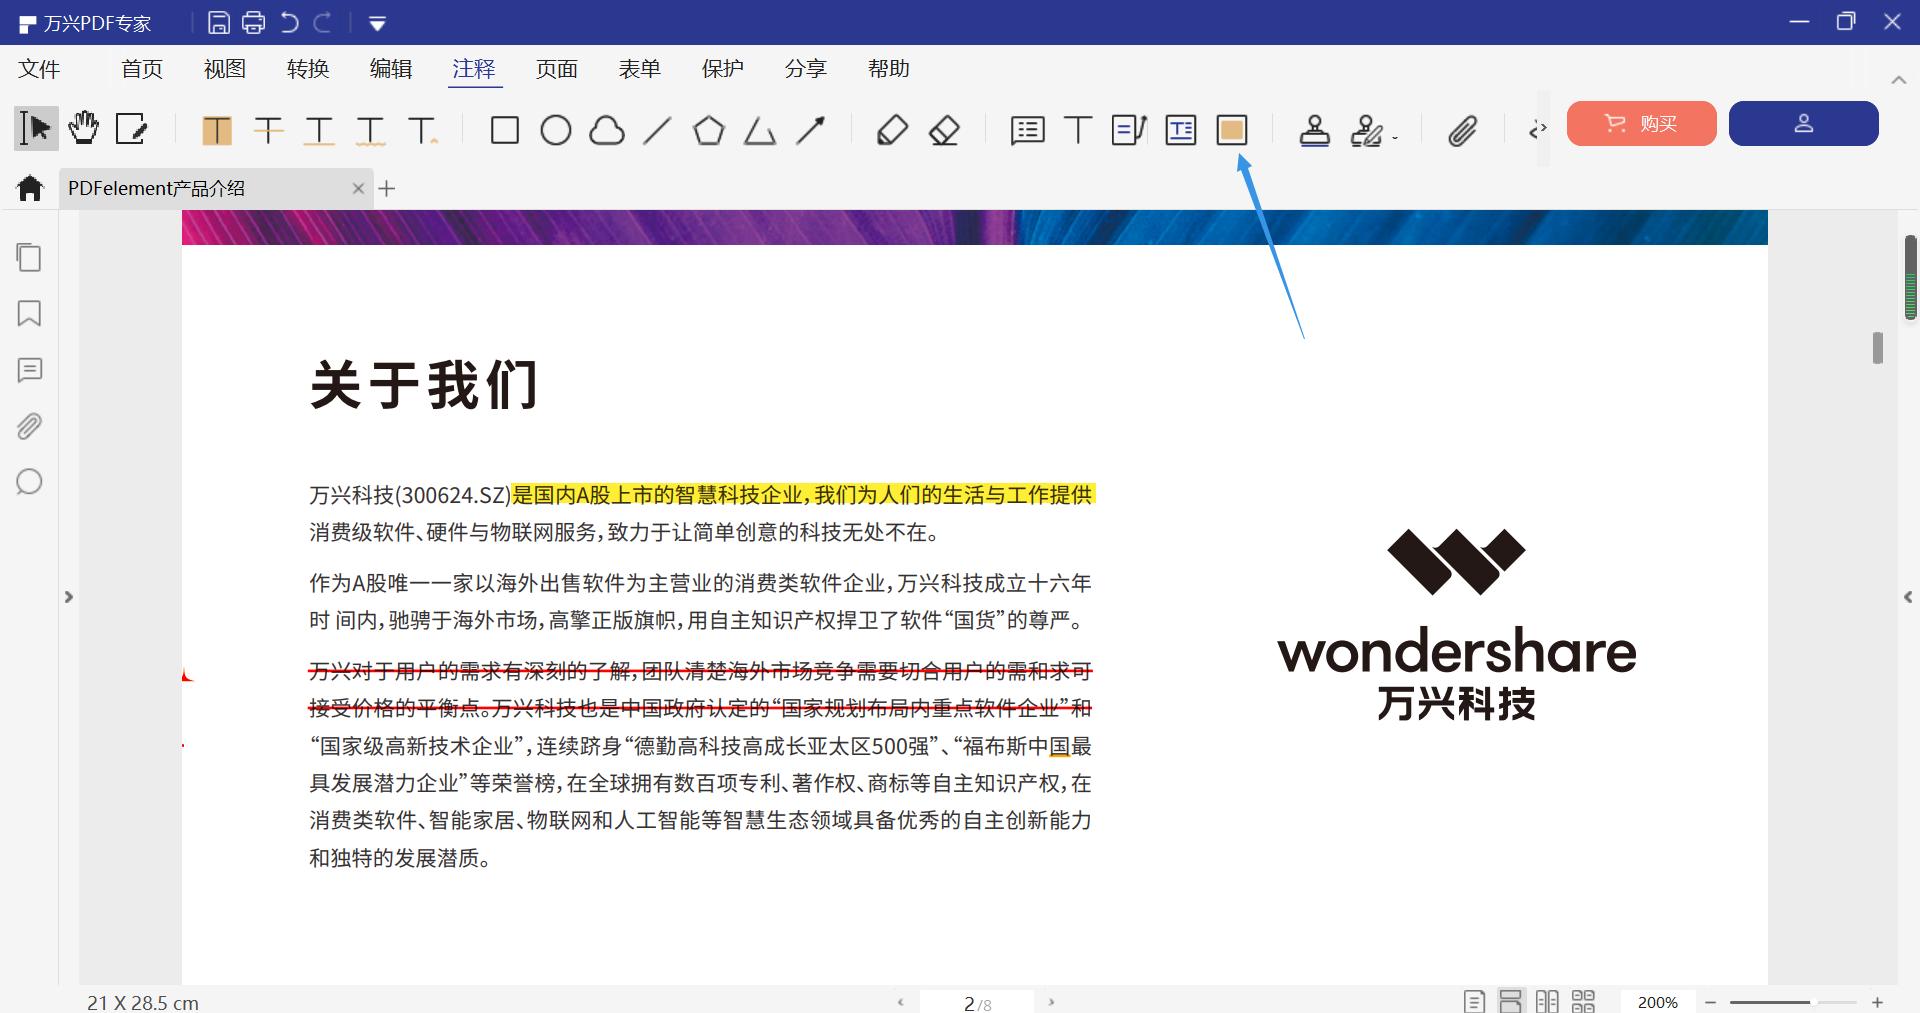 PDF文档注释步骤2